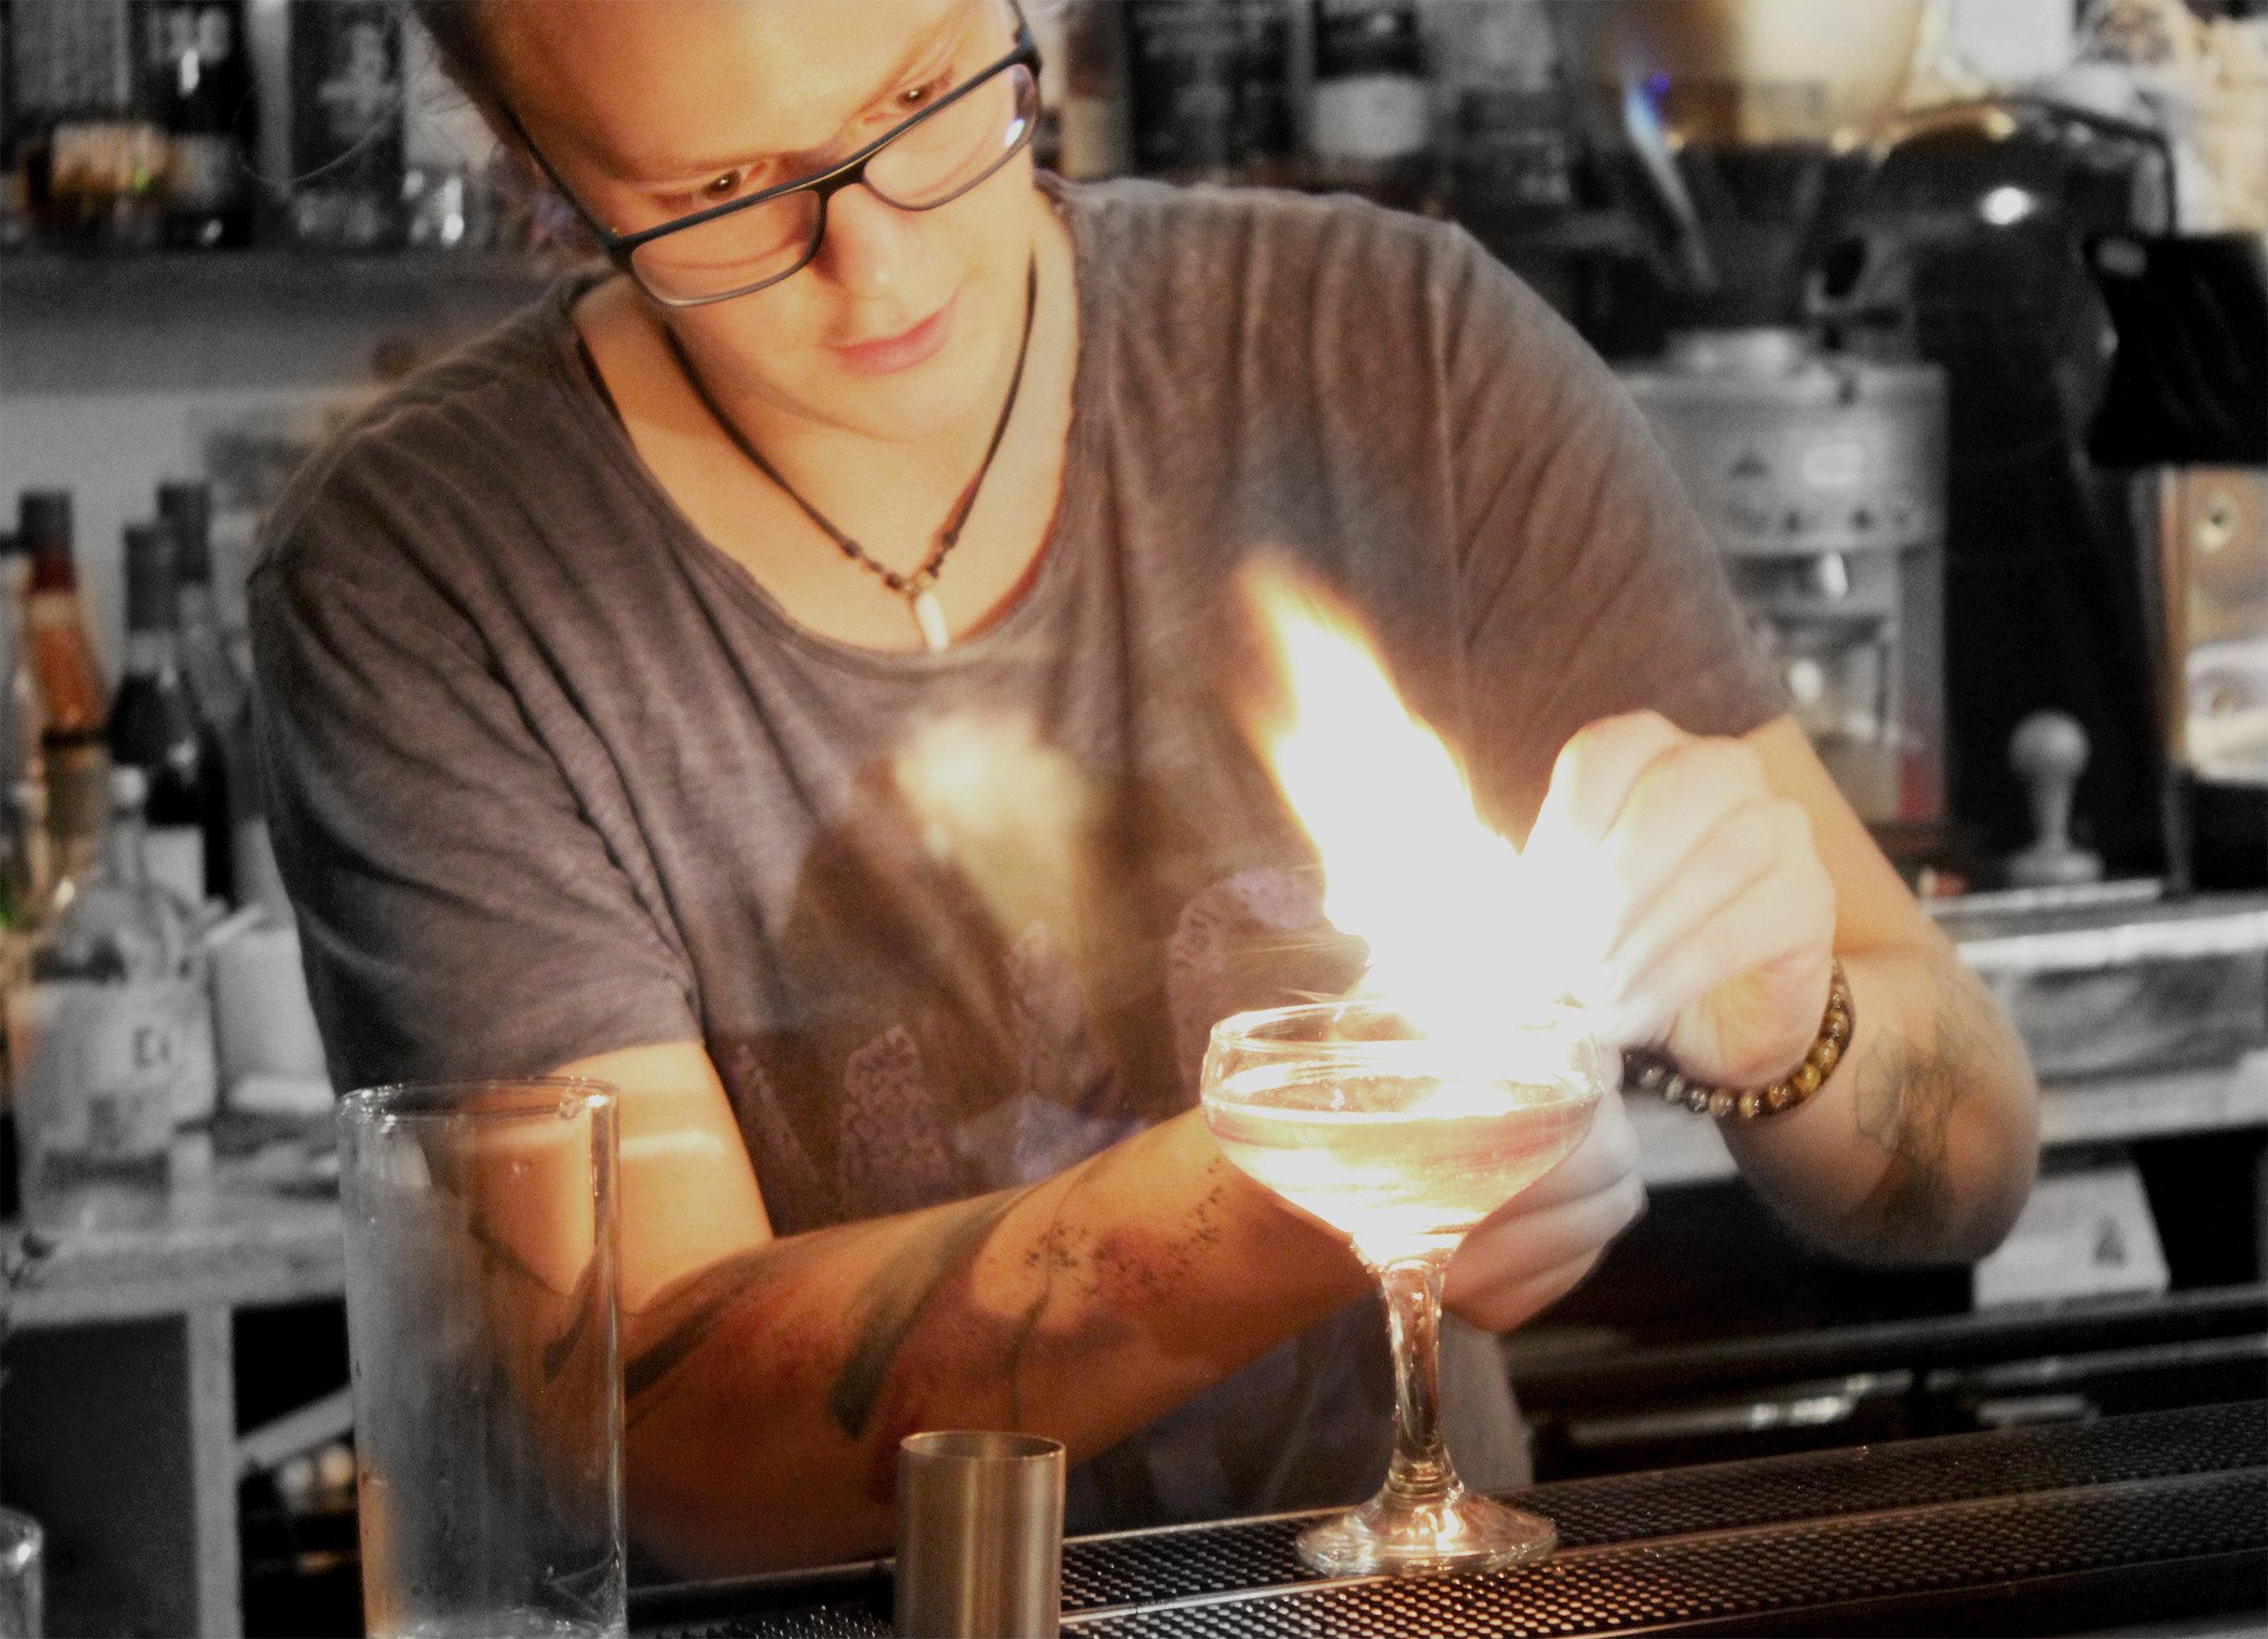 The Rosehip Bar - Over 200 malt whiskiesScottish craft beers and spiritsCarefully selected wine list